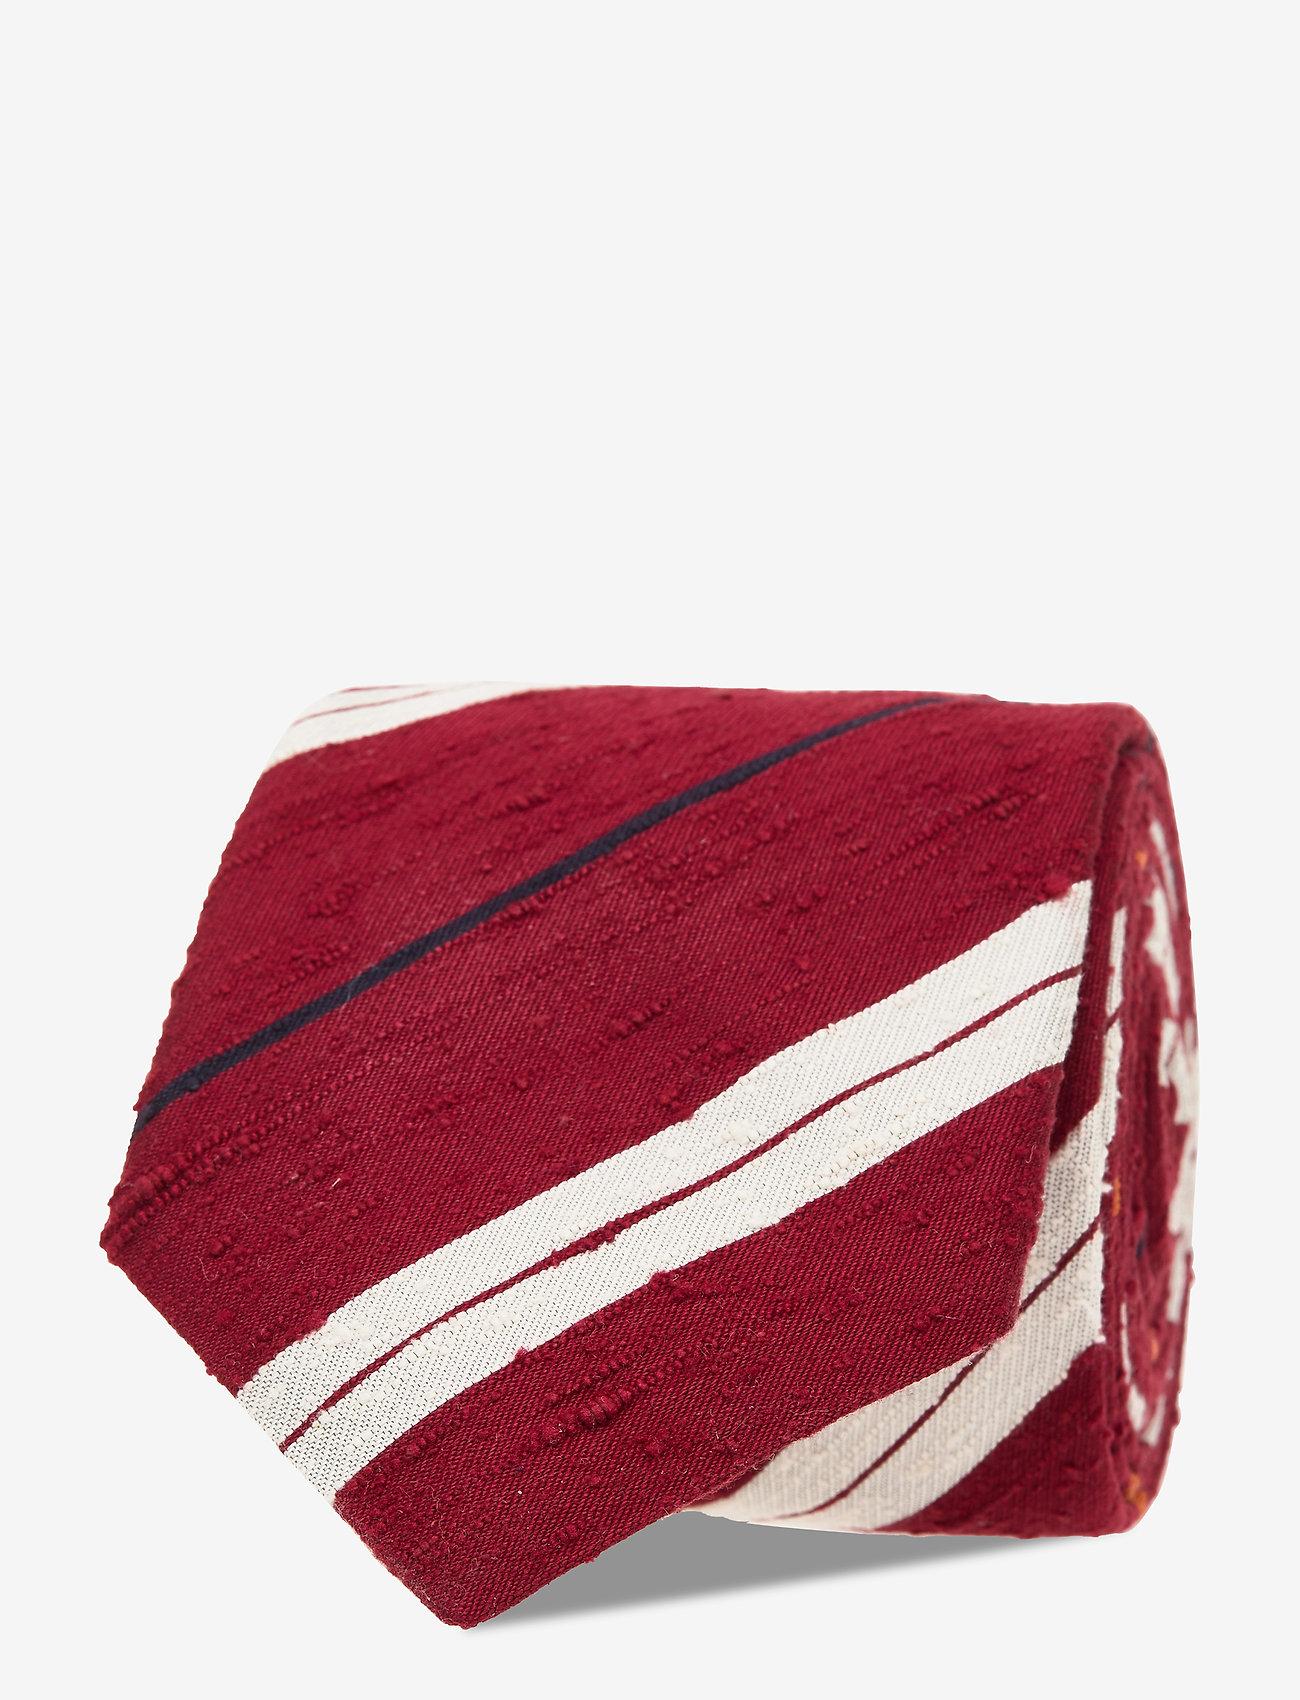 An Ivy - Red White Navy Orange Shantung Tie - cravates - red/white/navy - 1